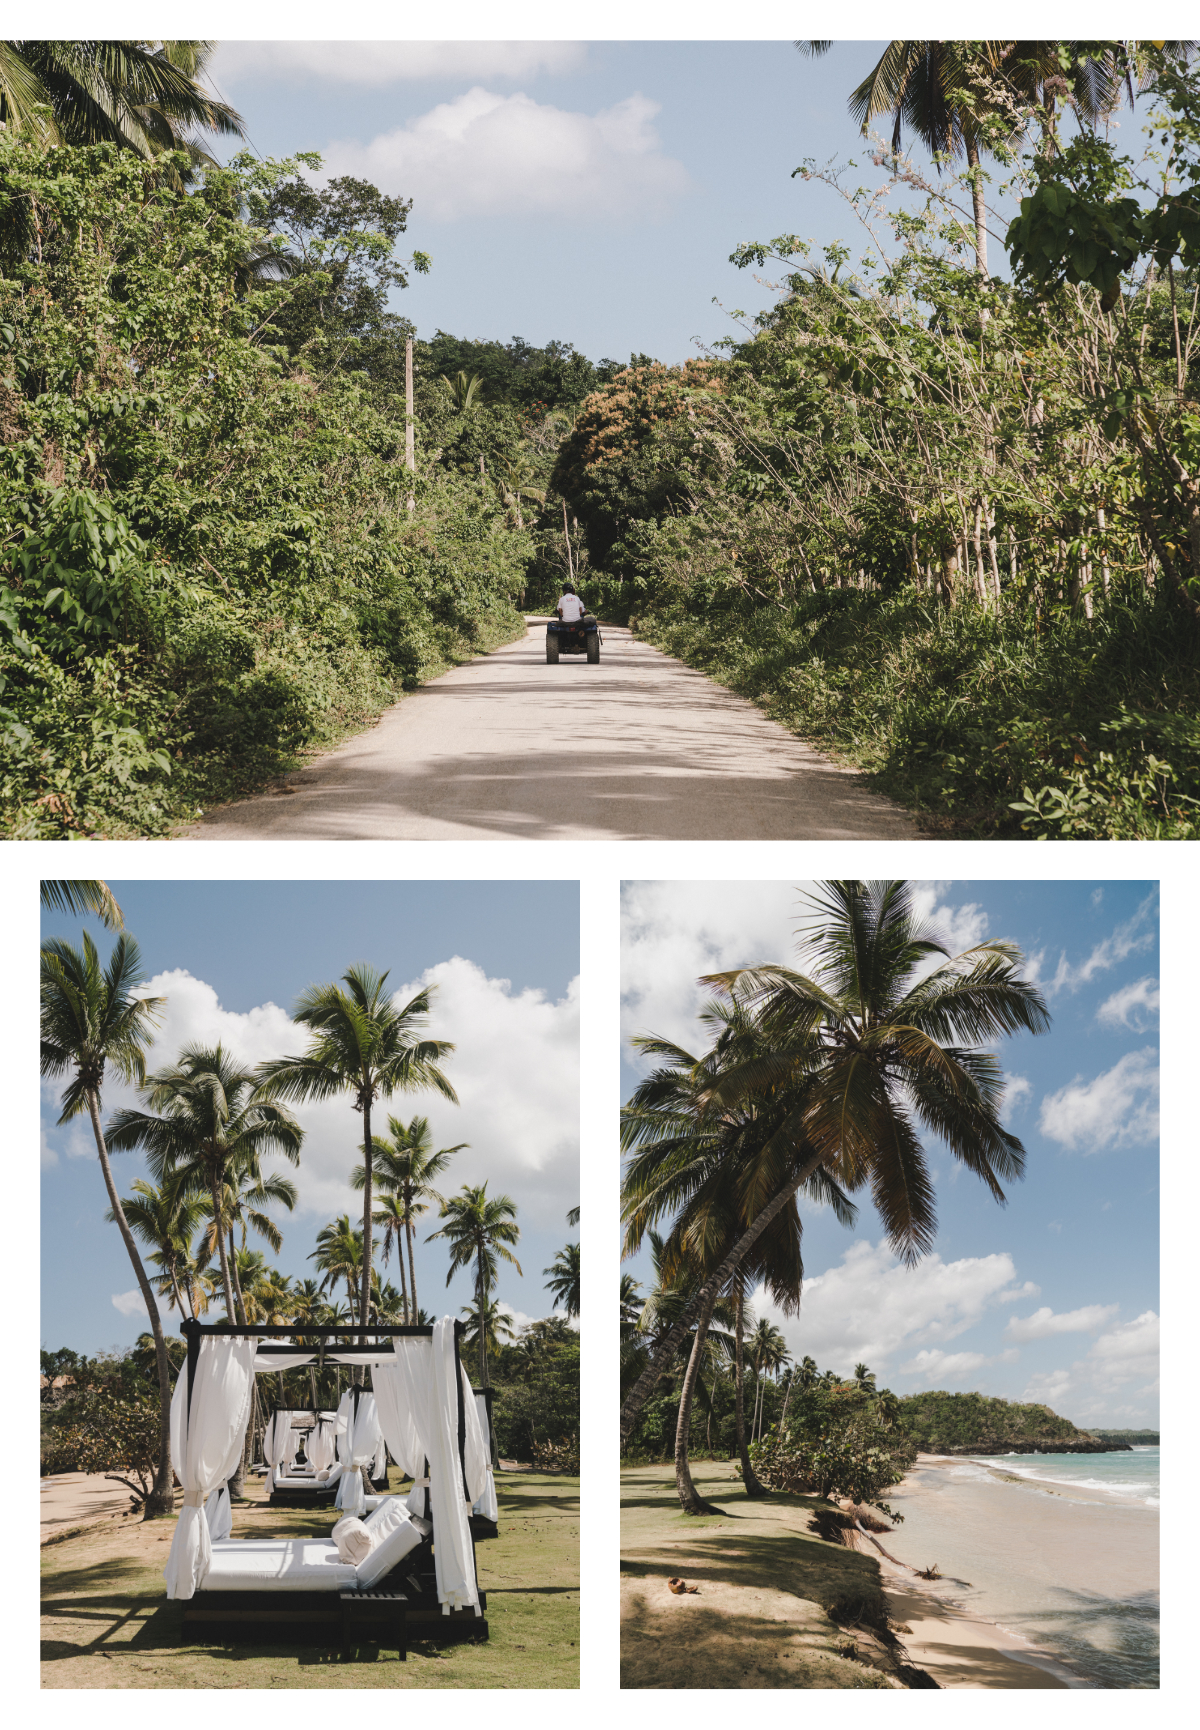 Voyage en République Dominicaine, playa El Moron